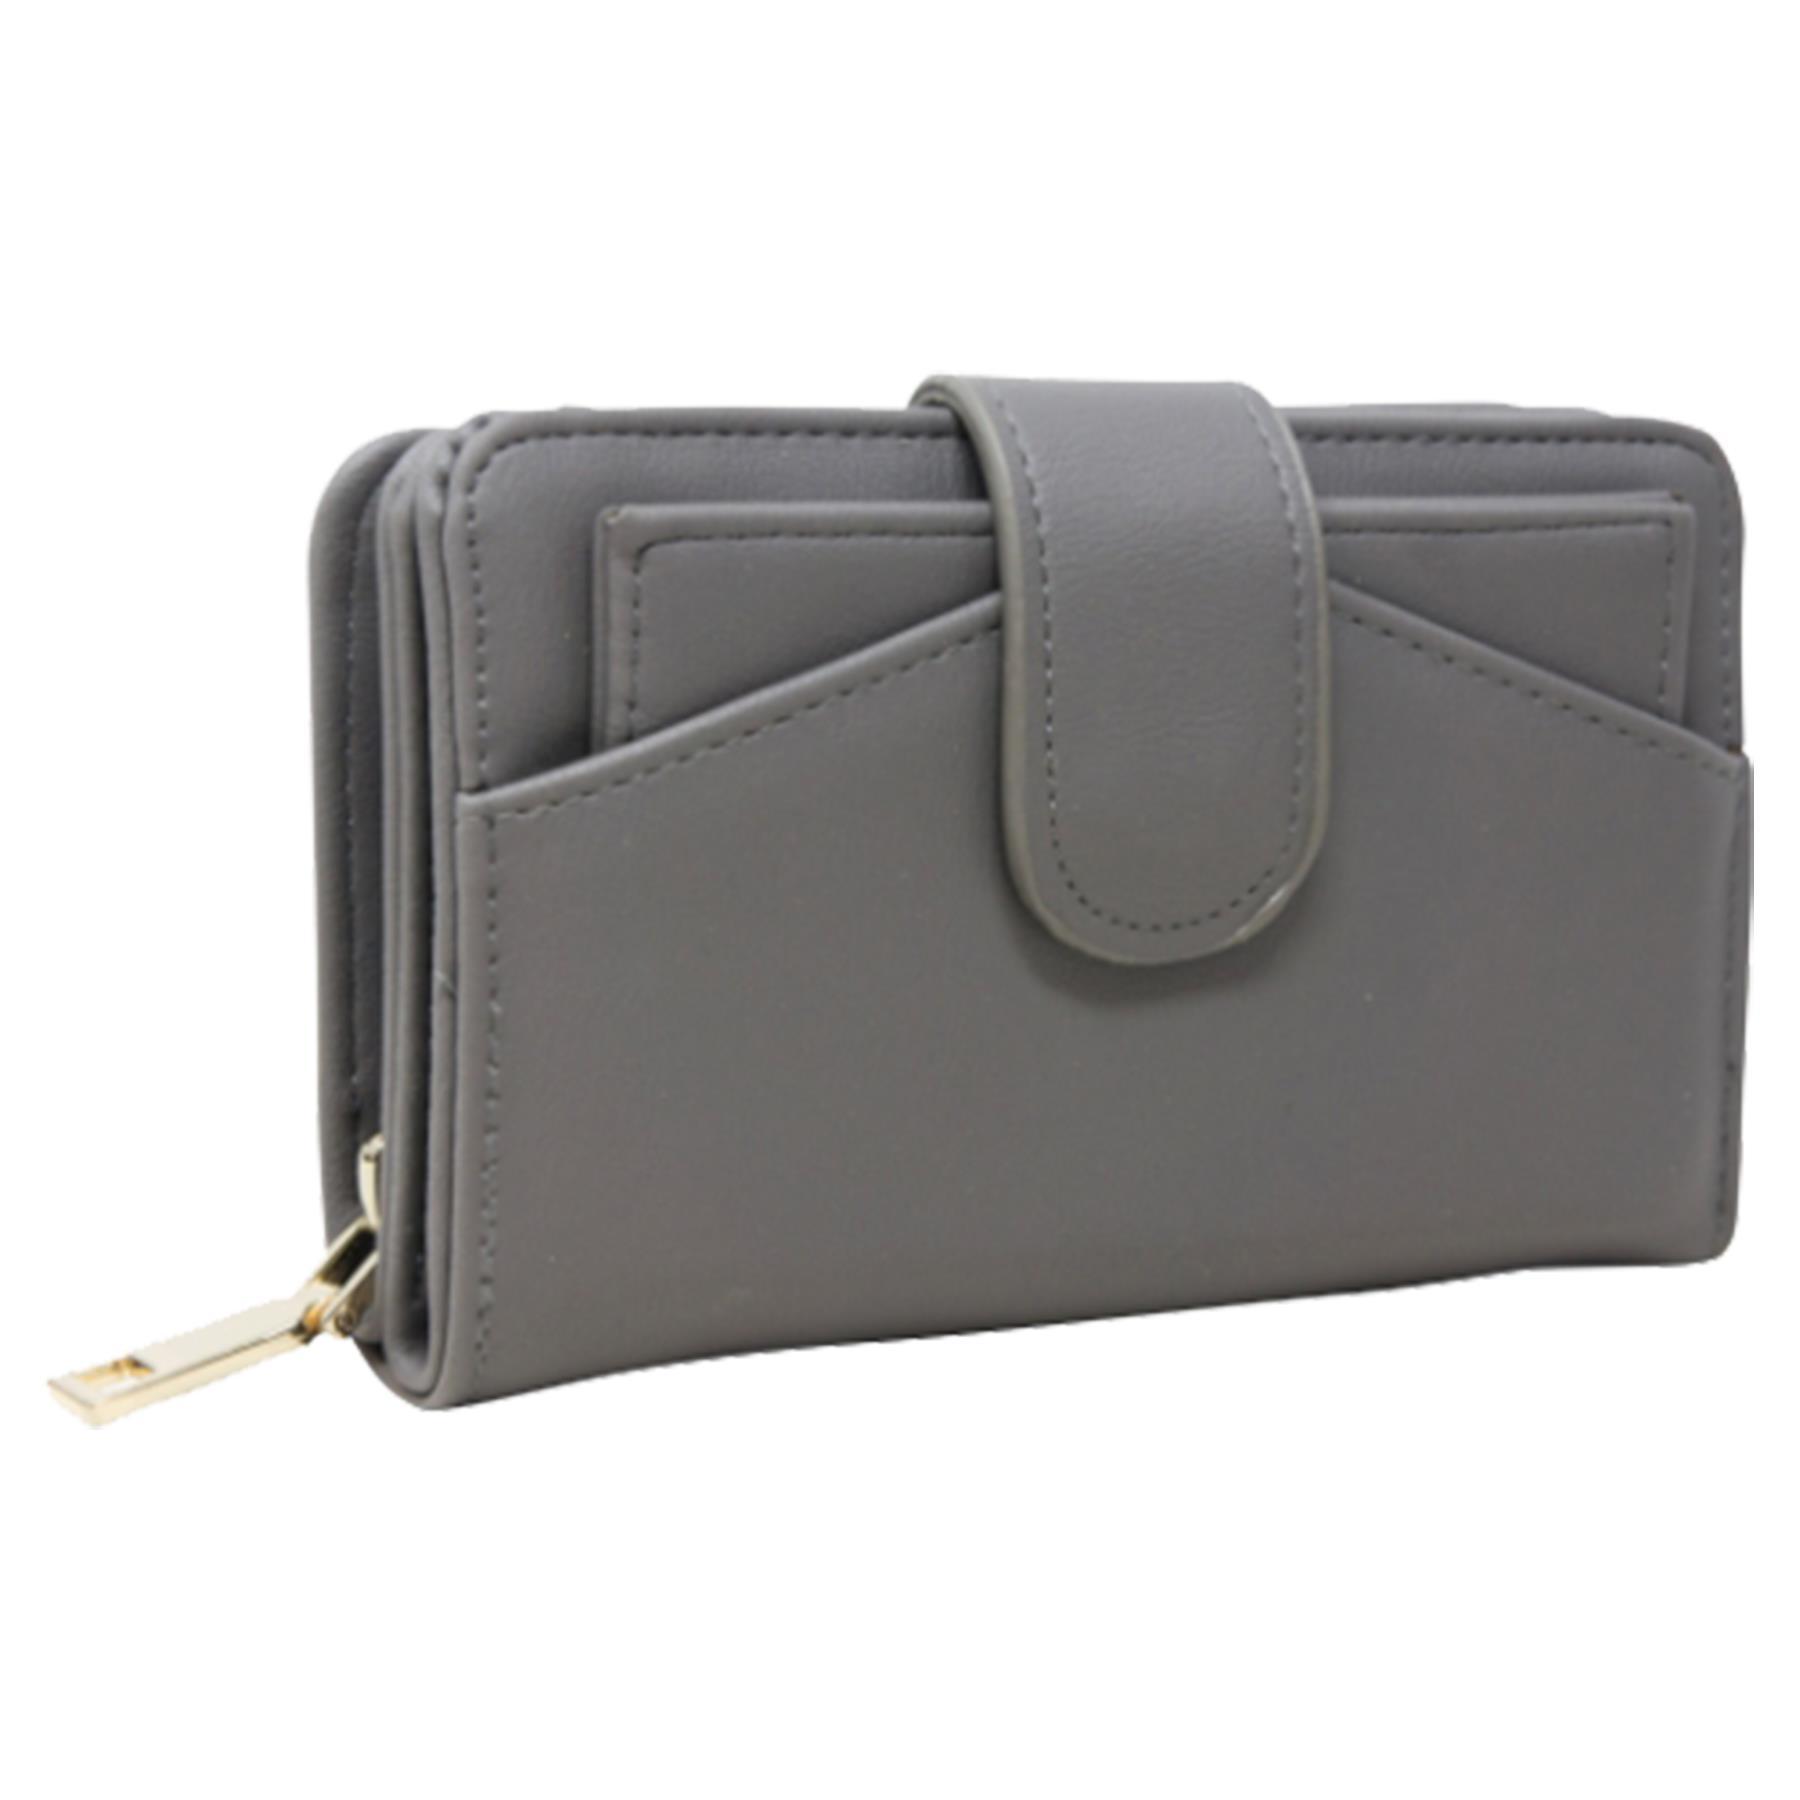 New-Ladies-Card-Slots-Zipped-Pocket-Faux-Leather-Basic-Wallet-Purse thumbnail 14